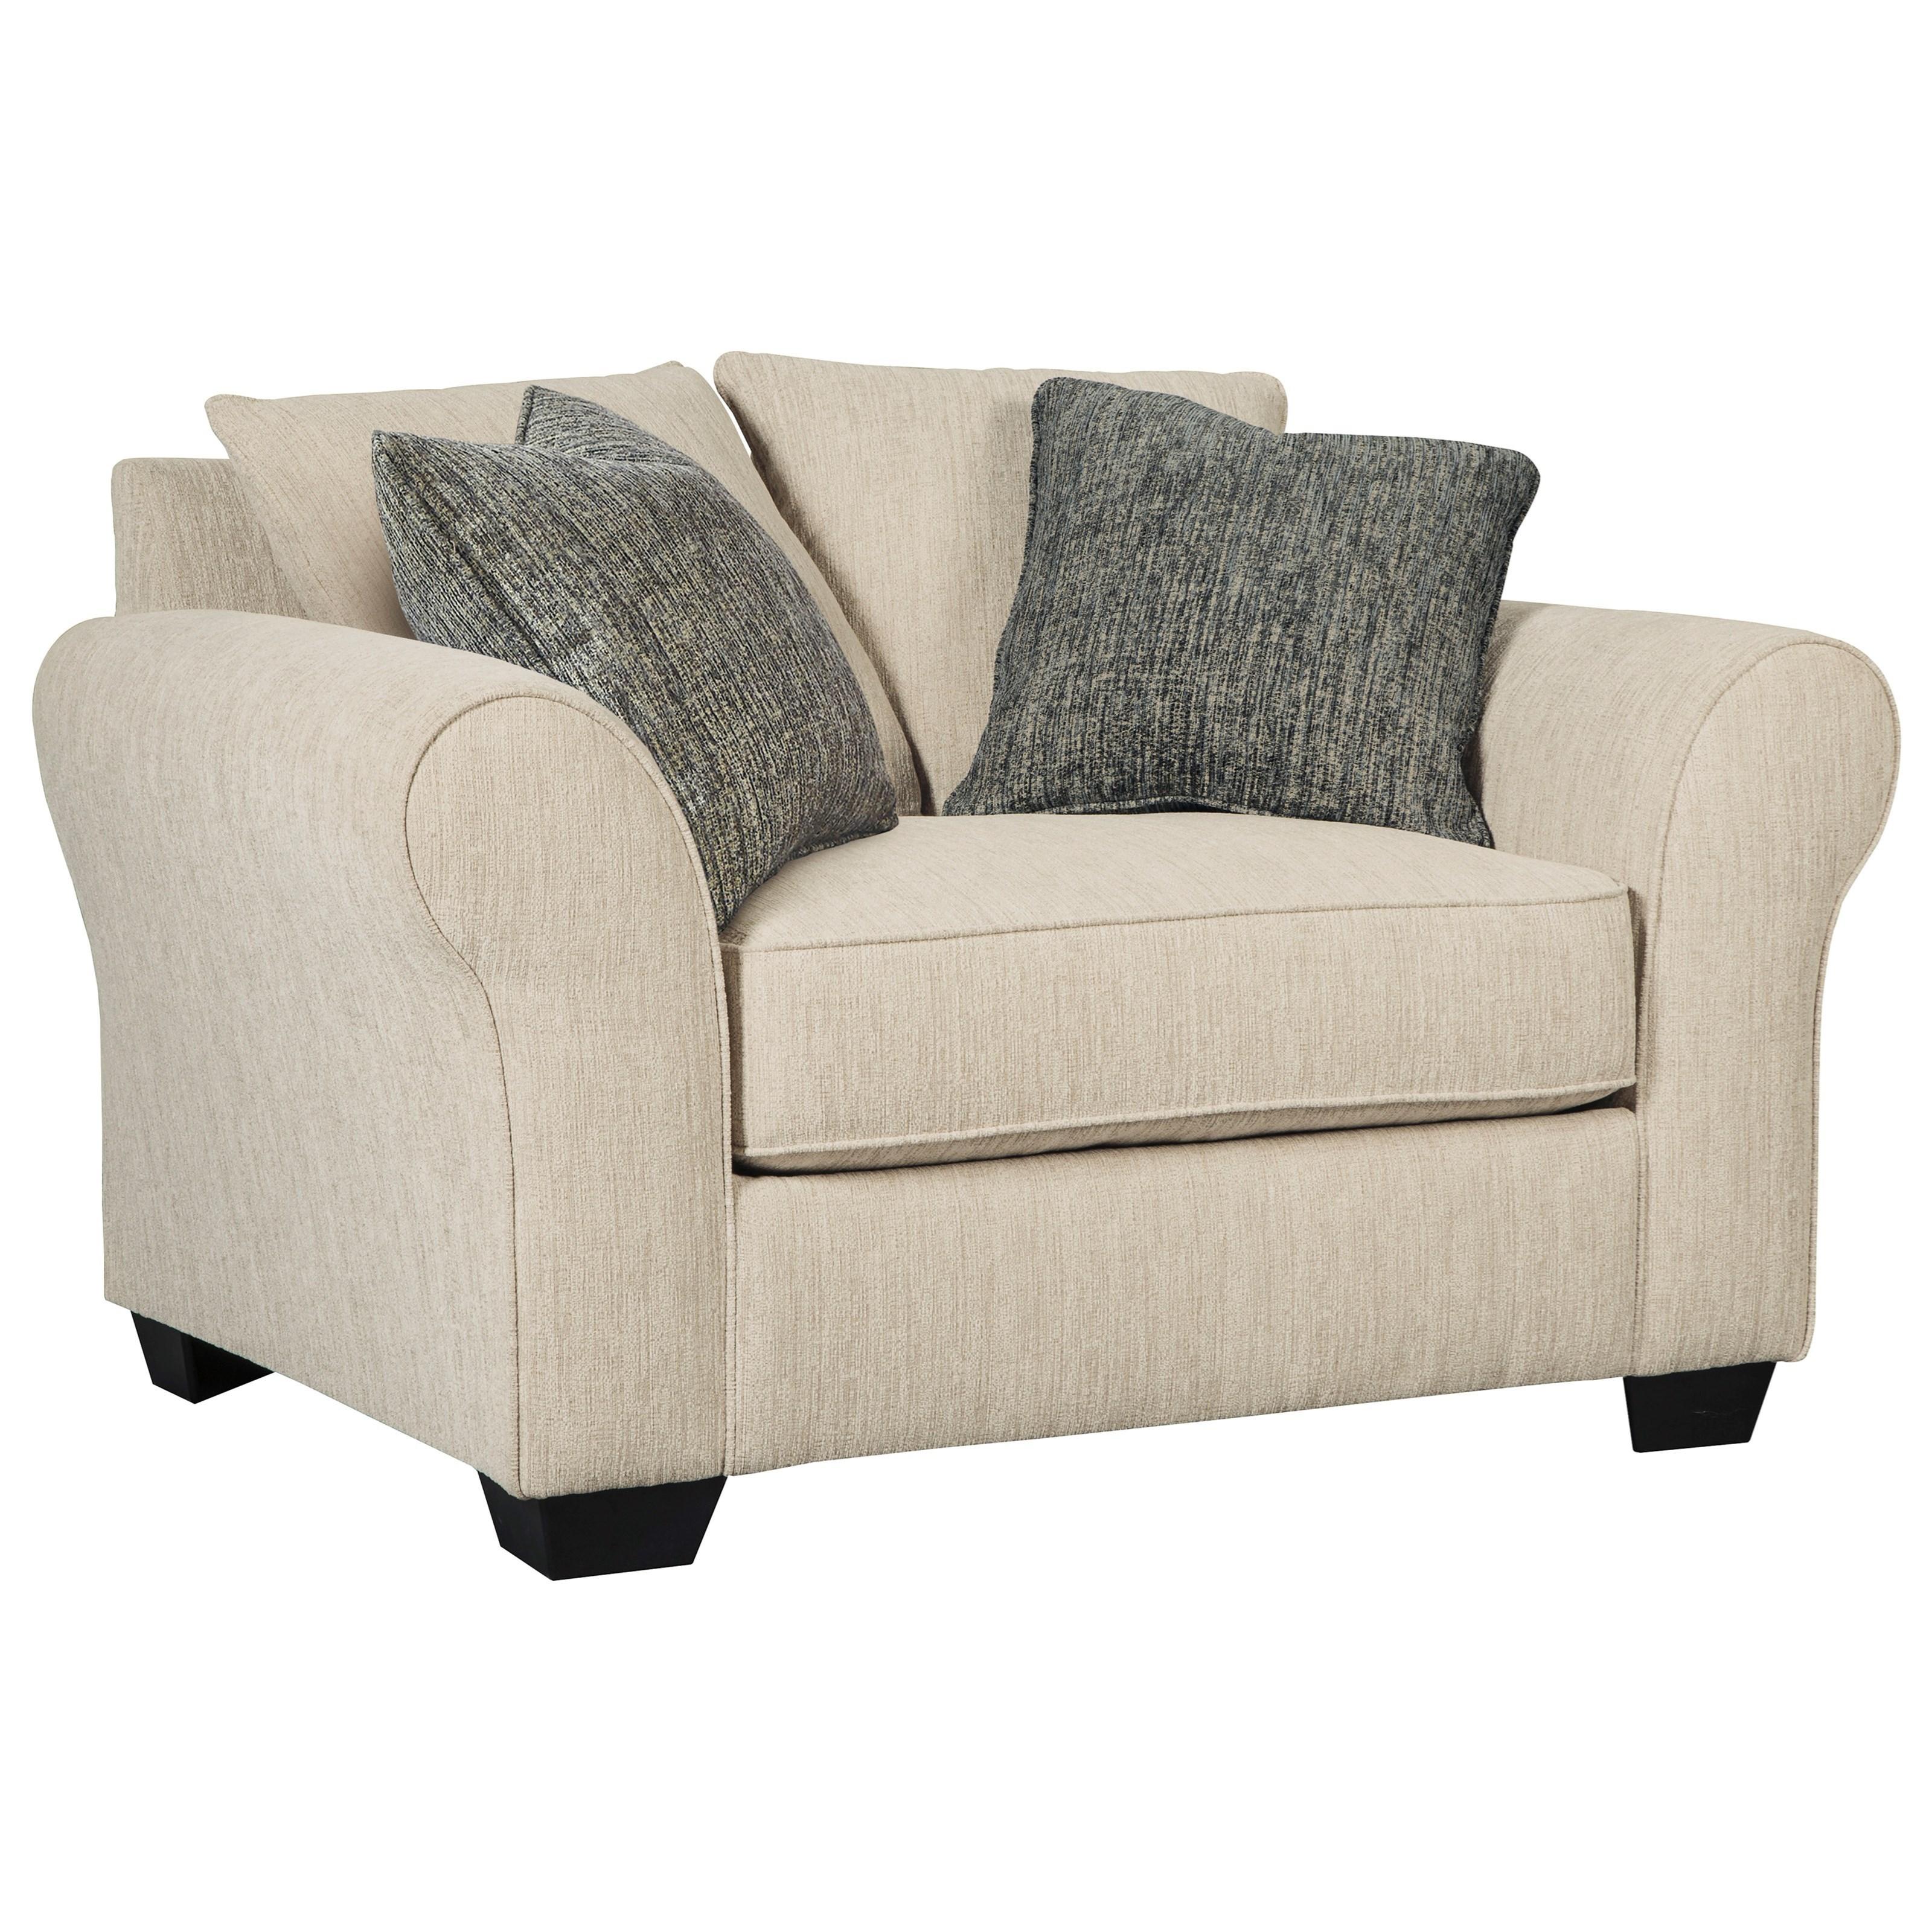 Silsbee Chair and a Half & Ottoman Becker Furniture